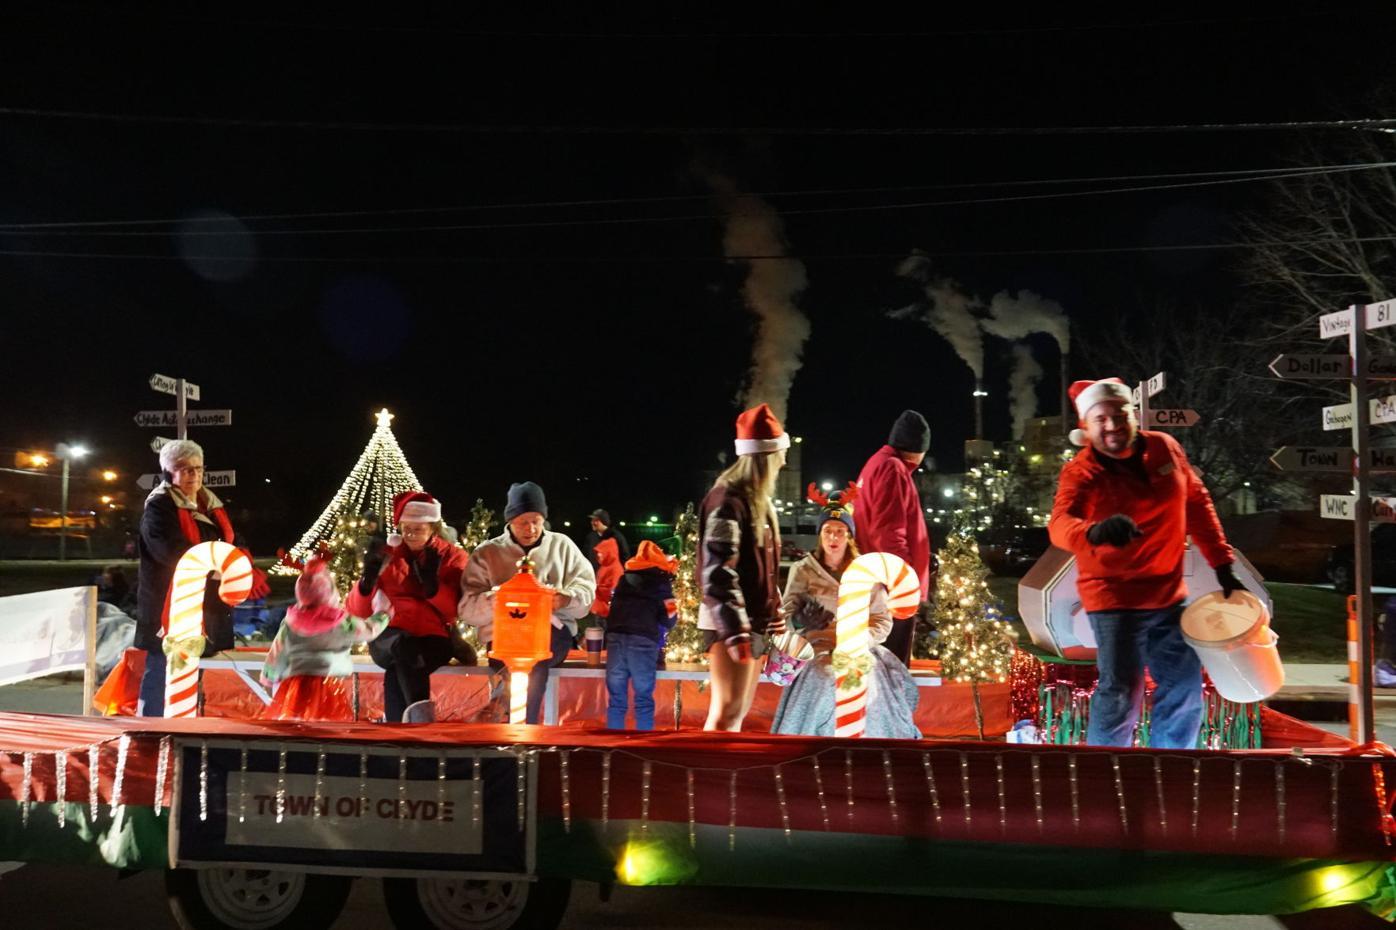 Canton Christmas Parade 2021 Canton Goes Big Bright With Plans For Christmas Parade News Themountaineer Com